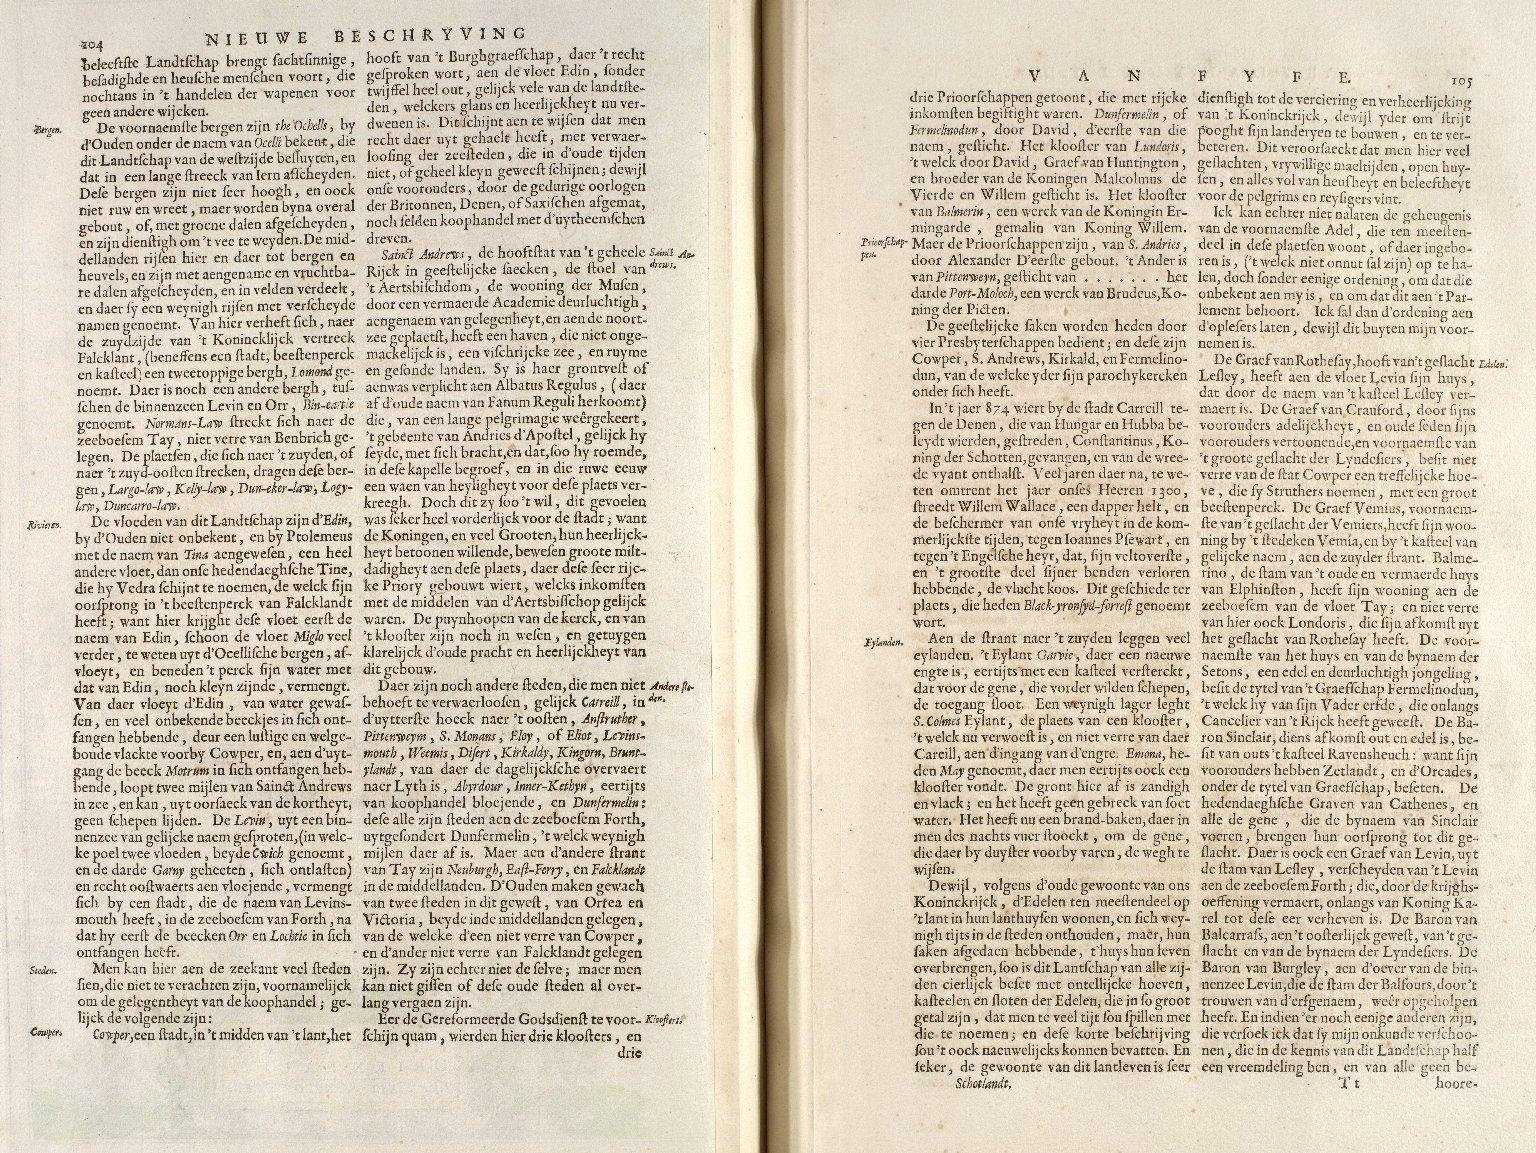 [Geographiae Blavianae] [Also known as: Atlas major] [093 of 153]